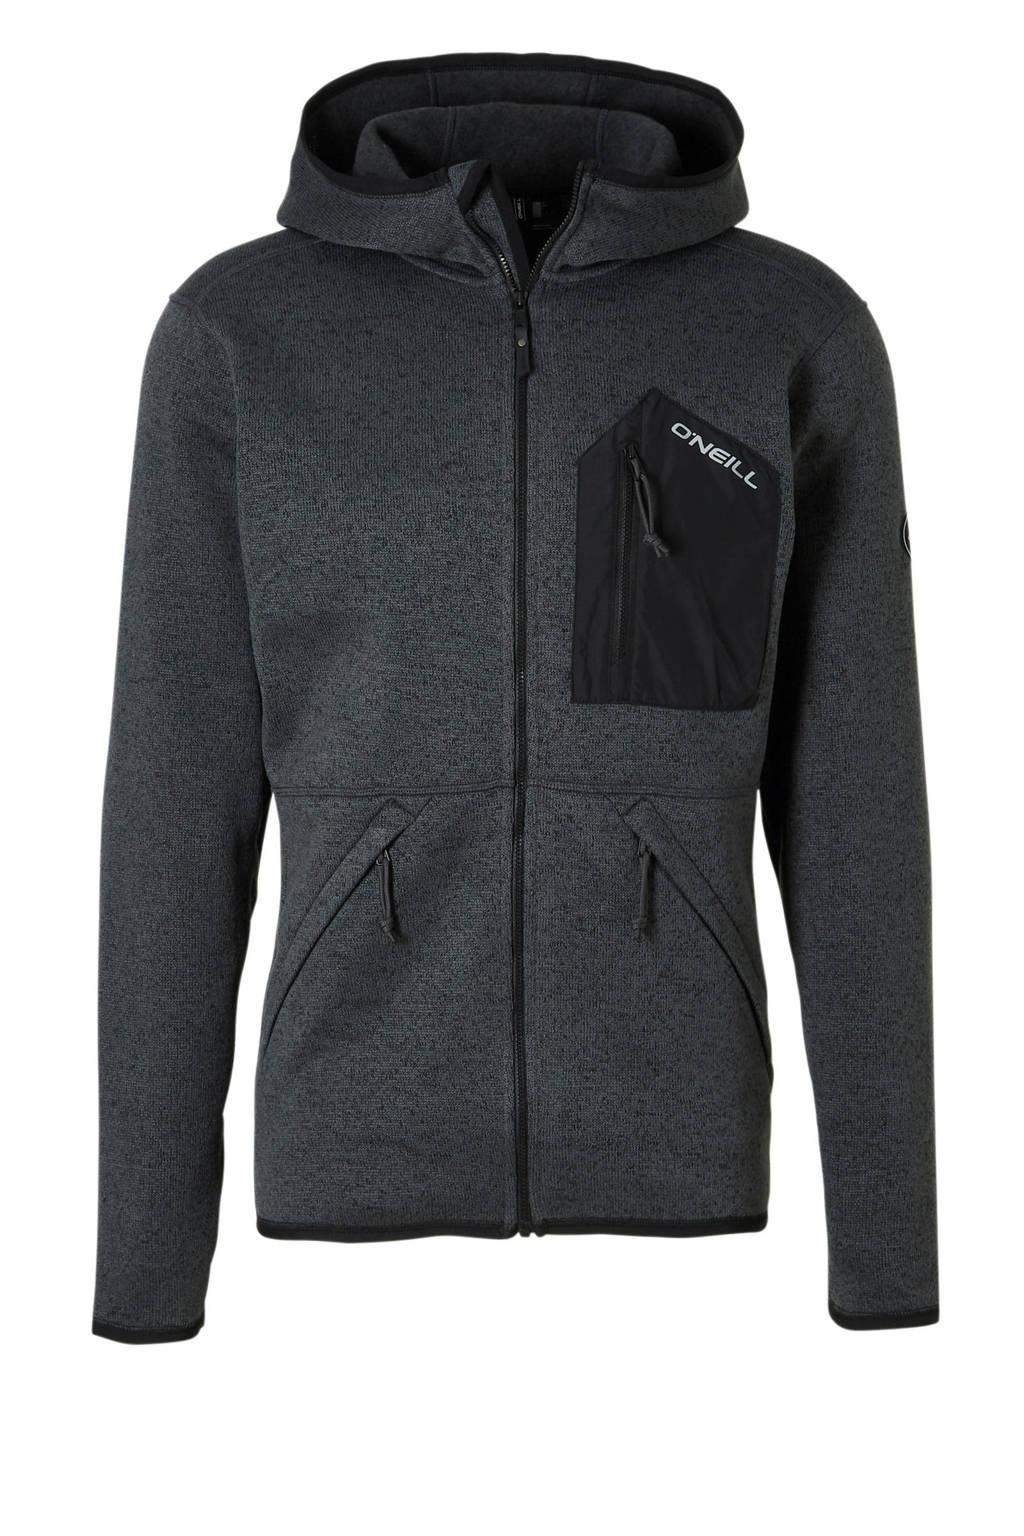 O'Neill   vest antraciet melange, Antraciet/zwart/wit